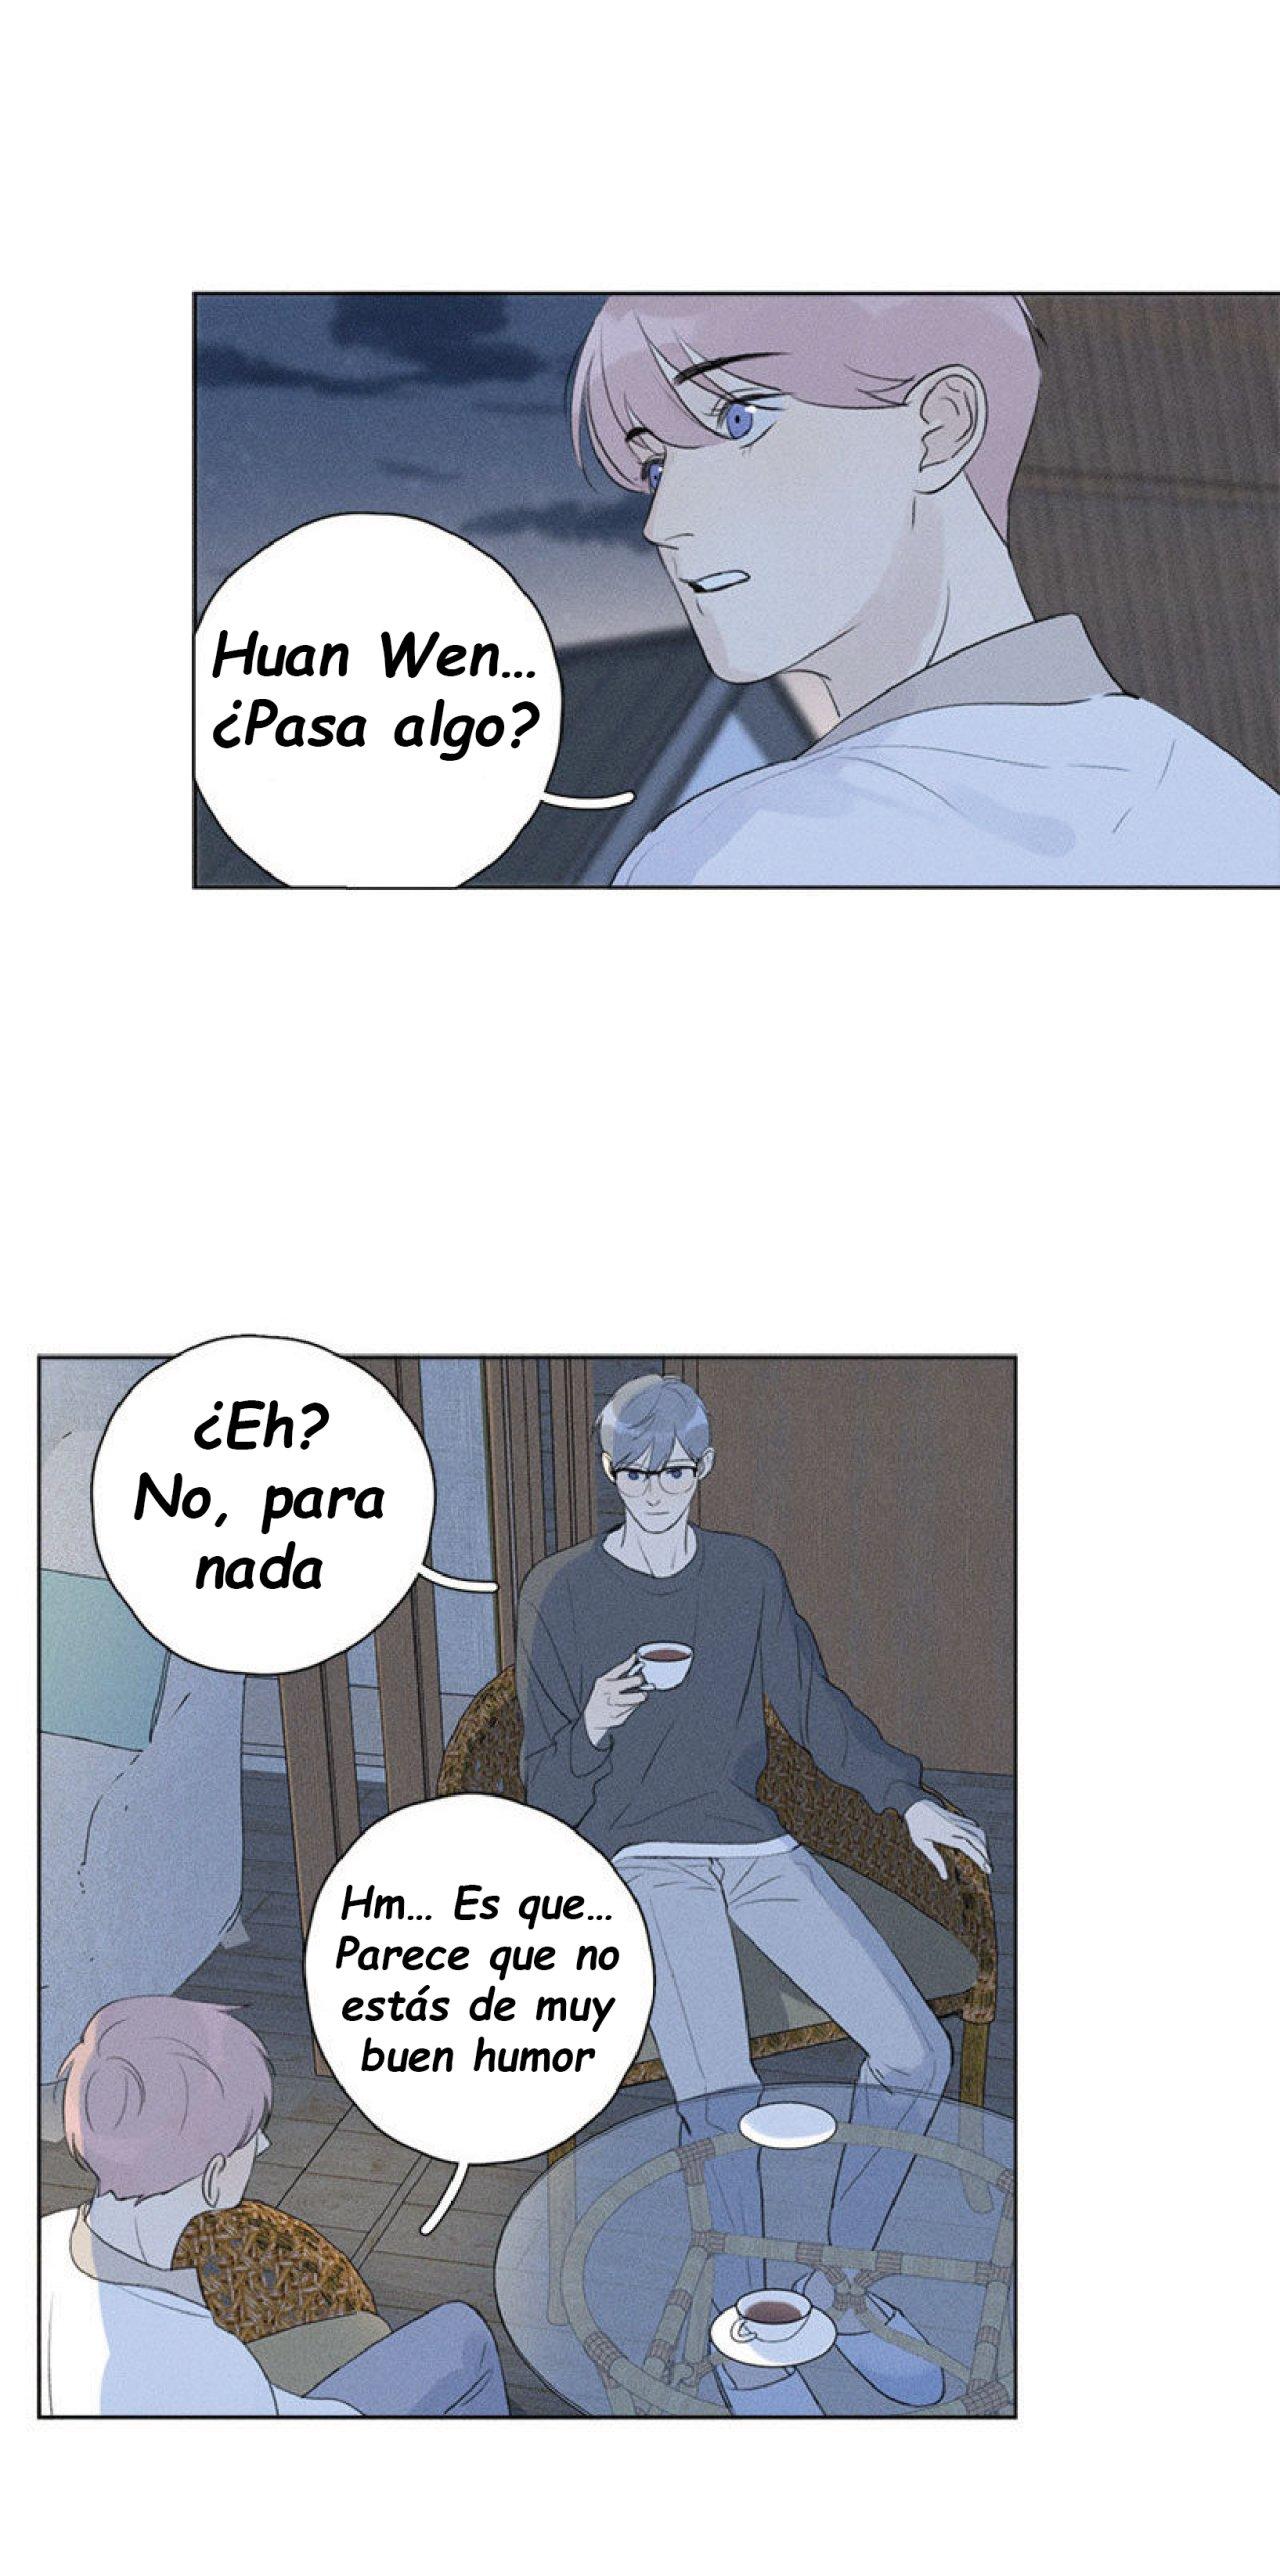 https://nine.mangadogs.com/es_manga/pic8/29/24925/957375/f9ec877d312bd24f7a54ec092c68b29c.jpg Page 24